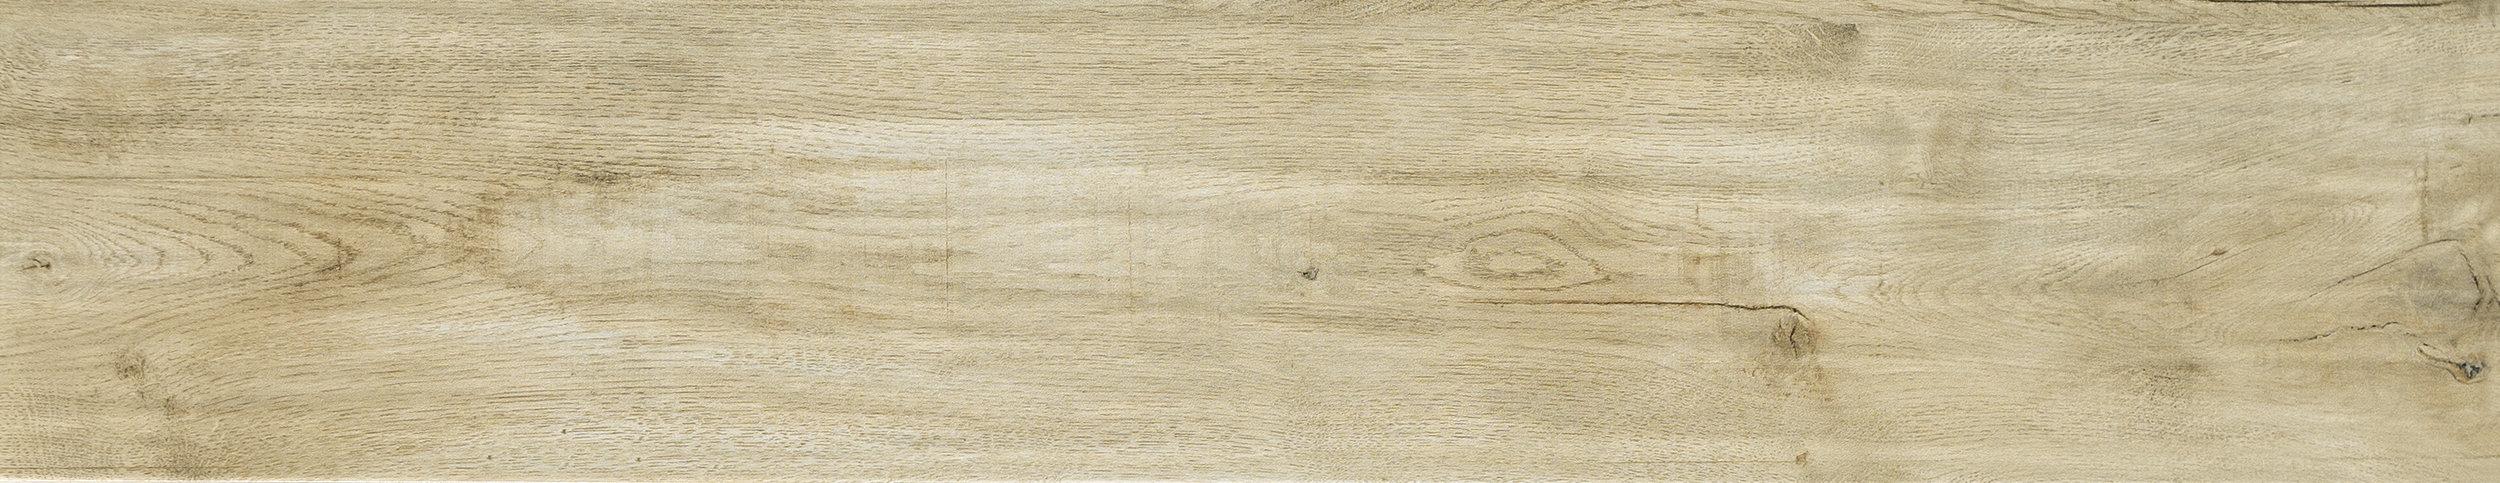 "log wood 6.5"" x 39.25"" cream"